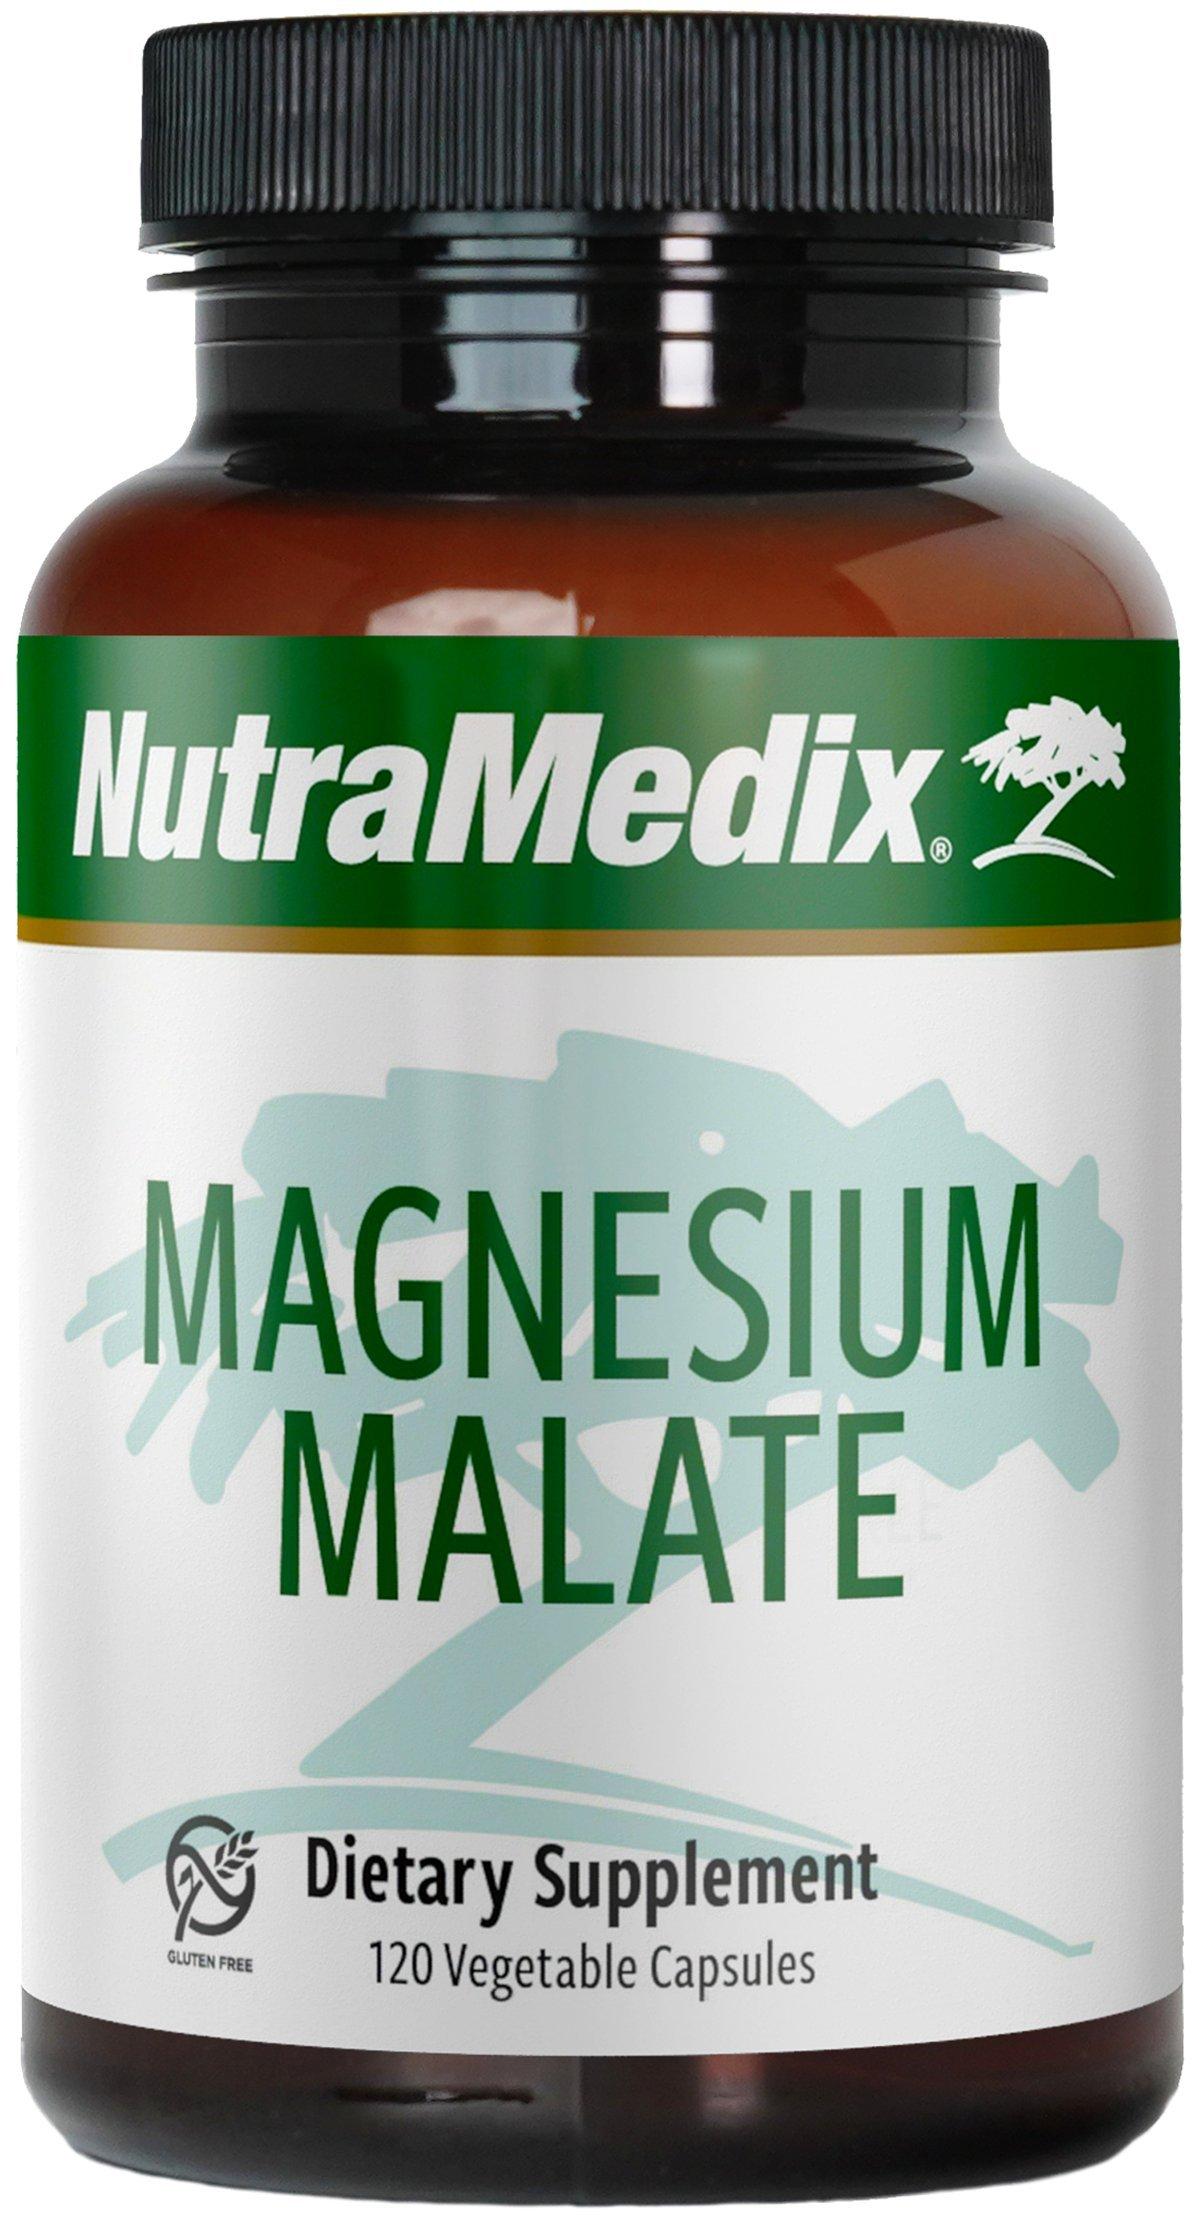 NutraMedix - Magnesium Malate, 120 Vegetarian Capsules